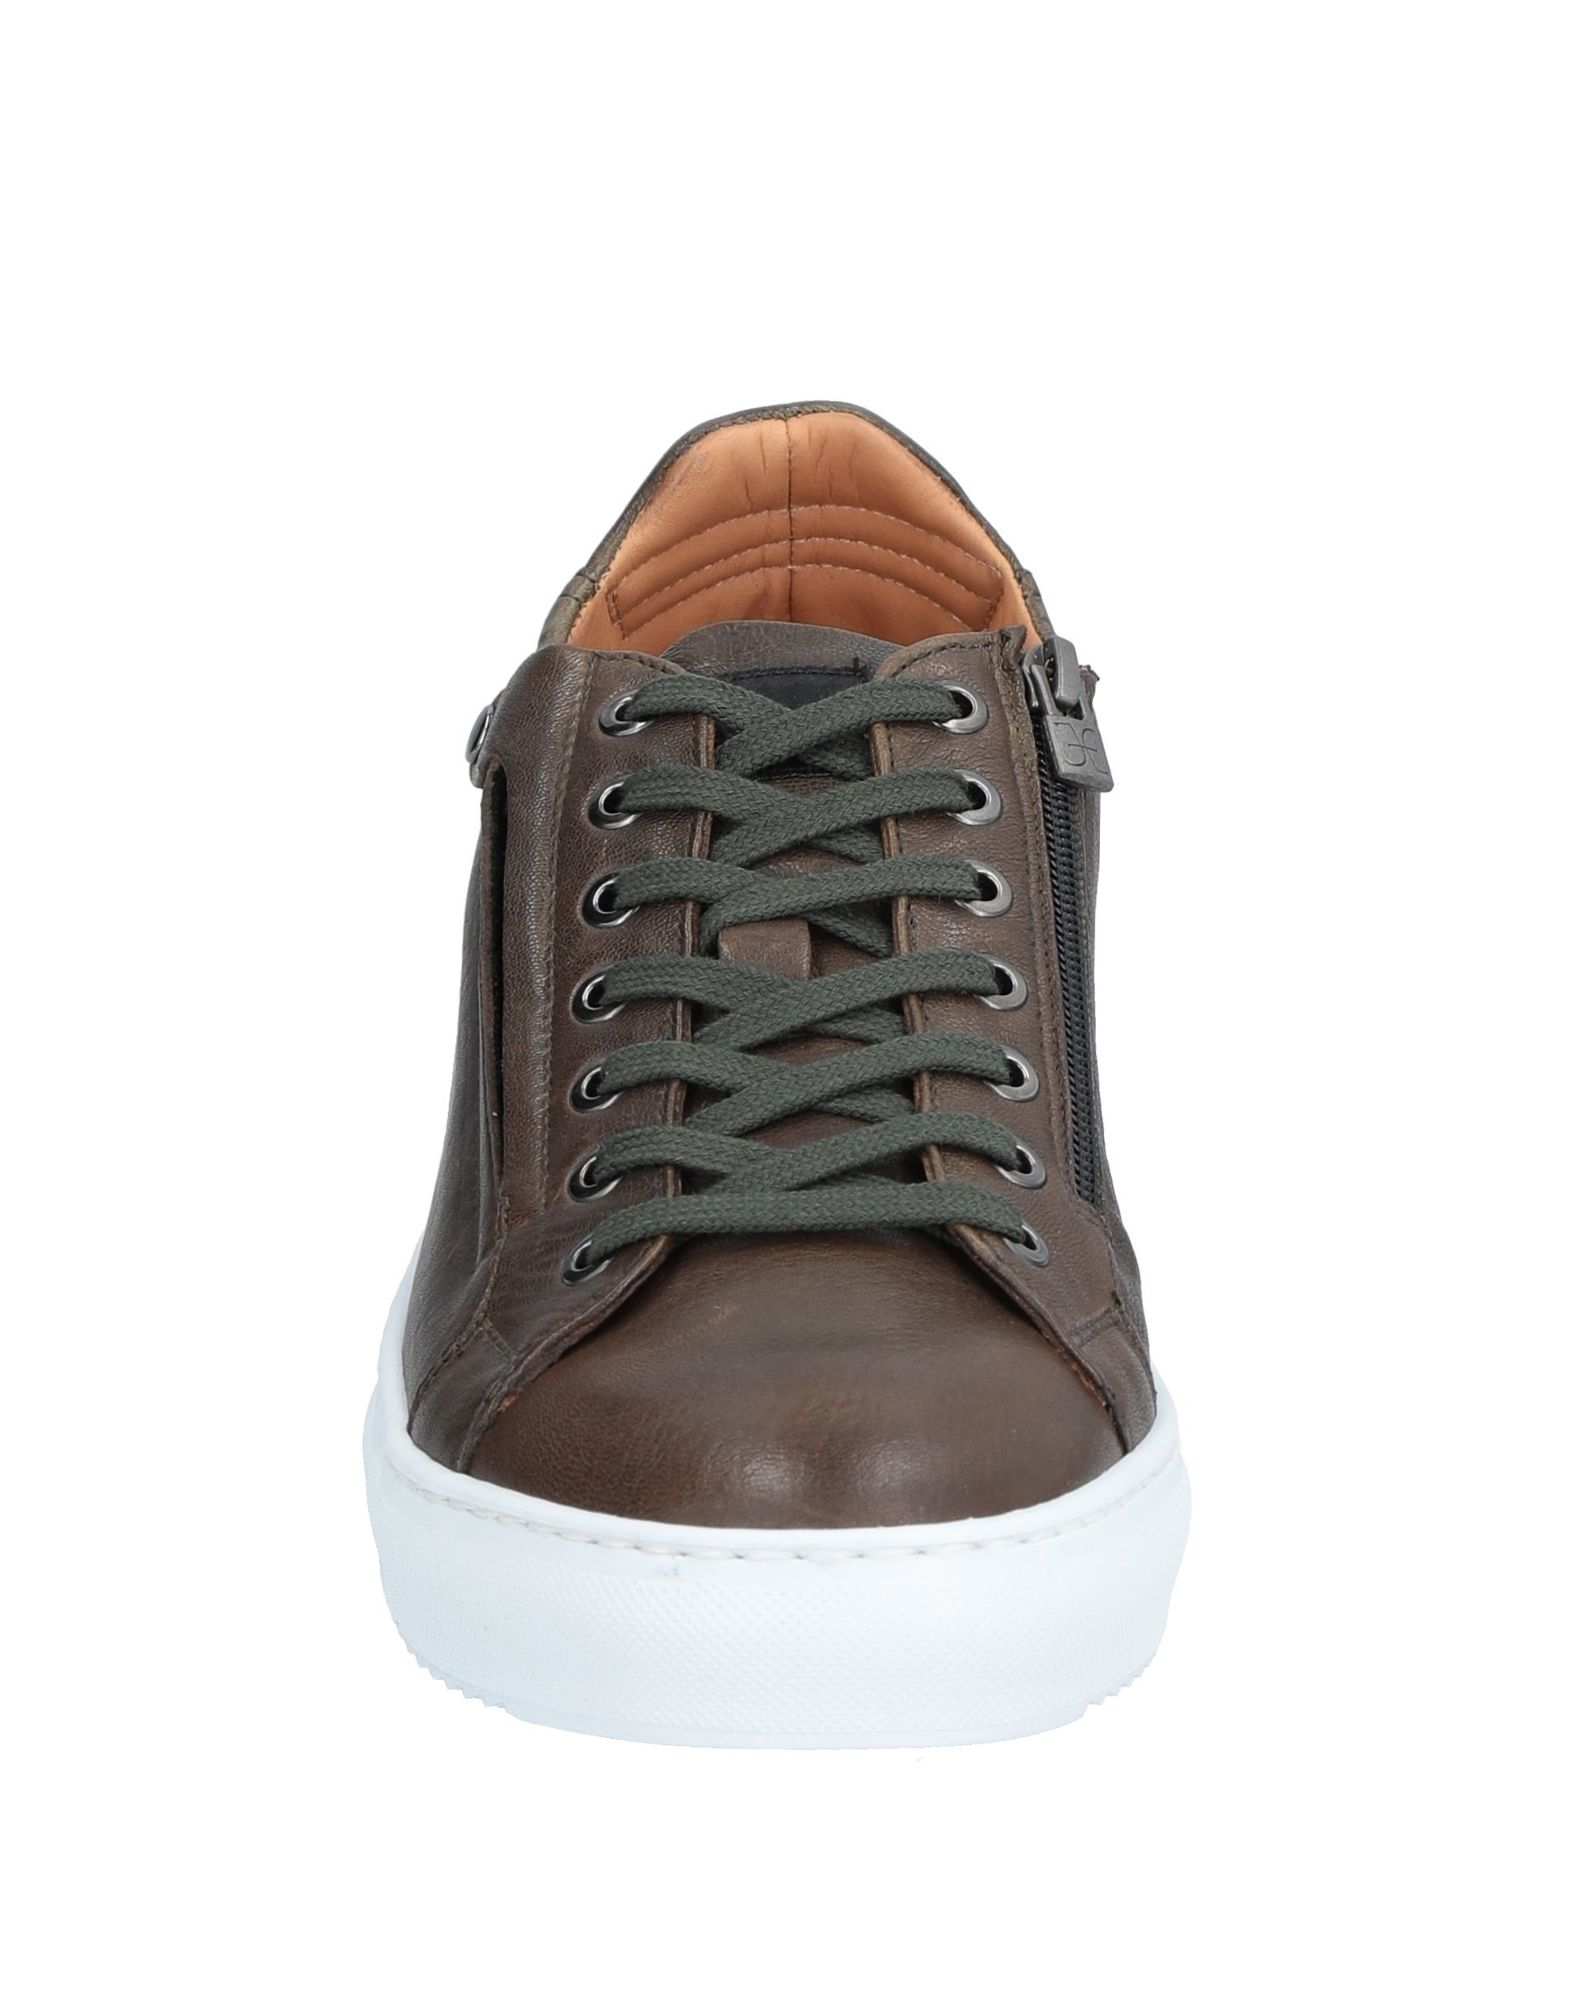 Fabi Sneakers Herren  11536149DA 11536149DA 11536149DA Gute Qualität beliebte Schuhe 43df26